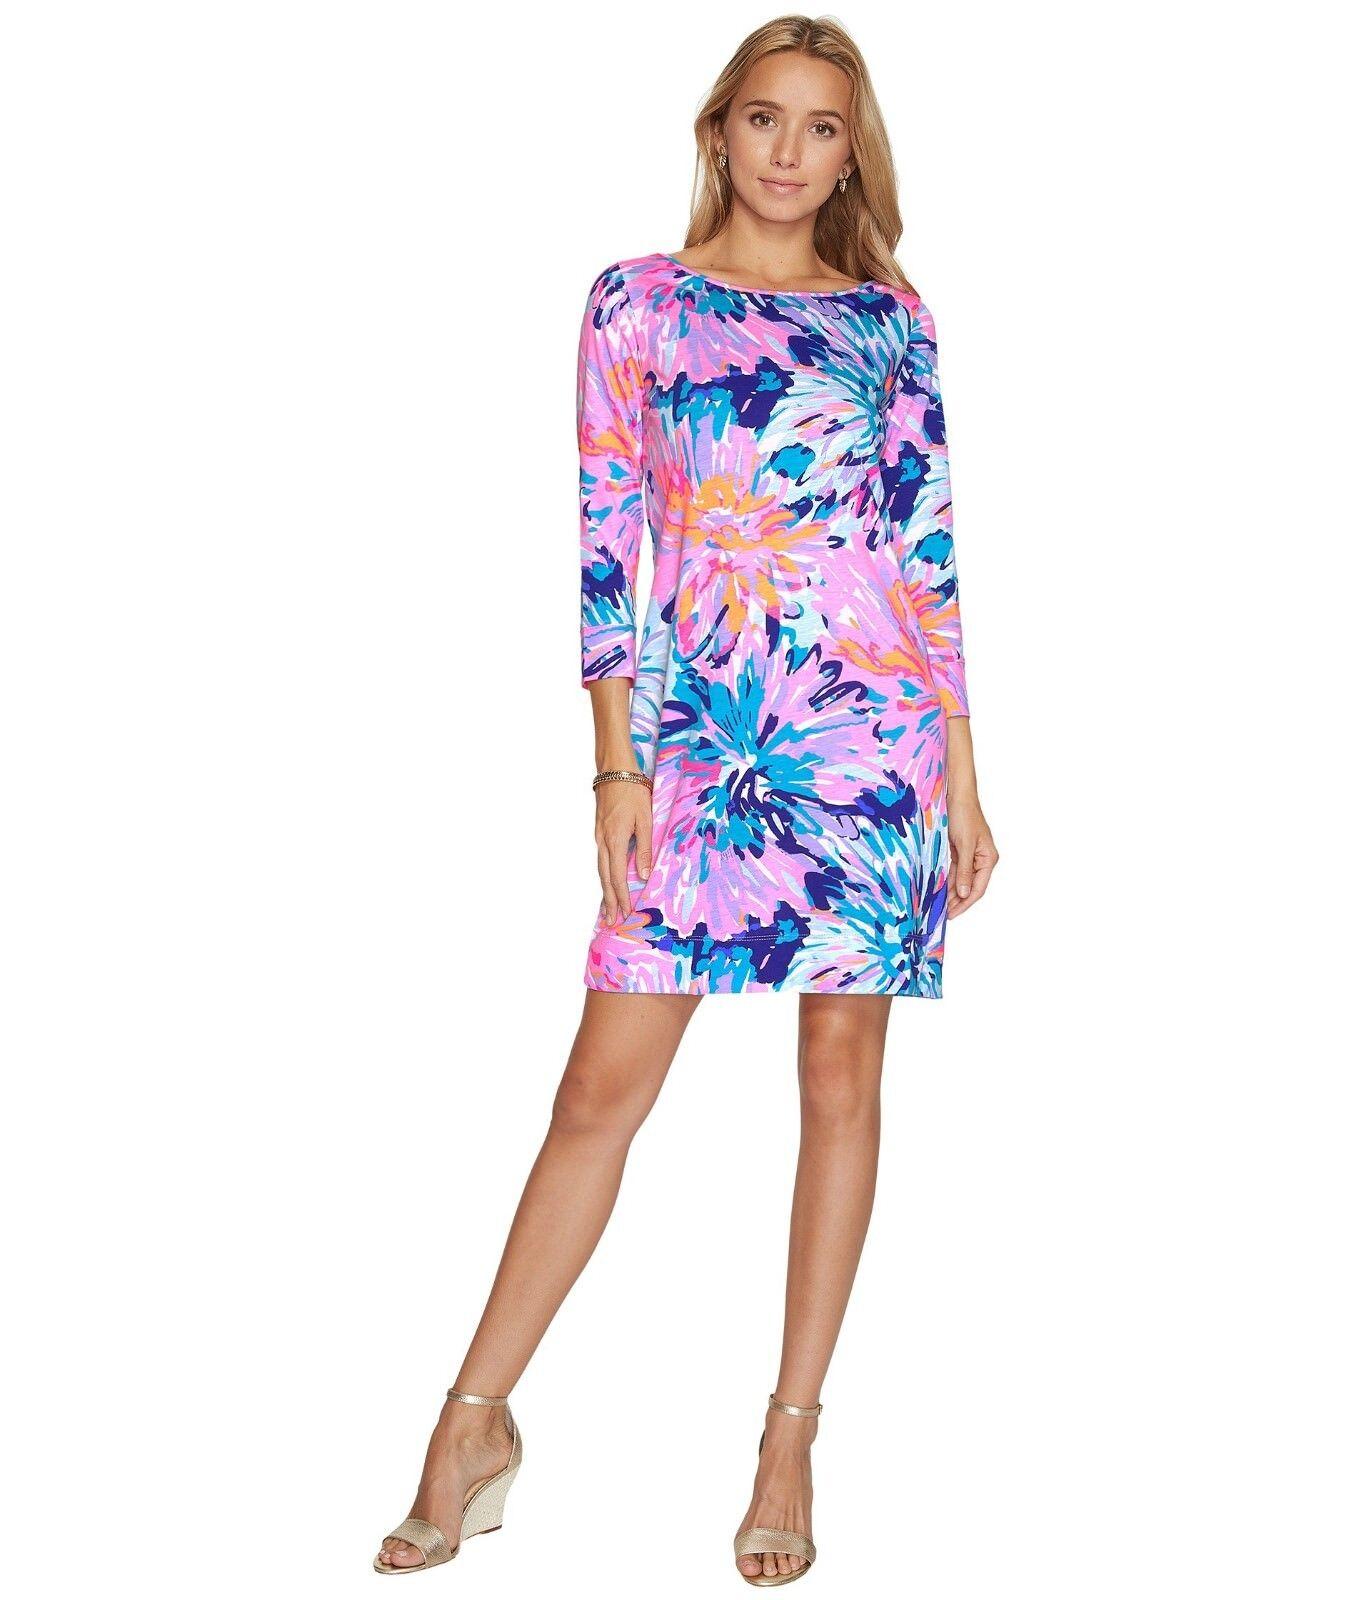 b6012595430a Lilly Pulitzer Robe T-Shirt Multi Off Tropique Réduit blue pink S Marlowe  Neuf npjjyj820-Dresses